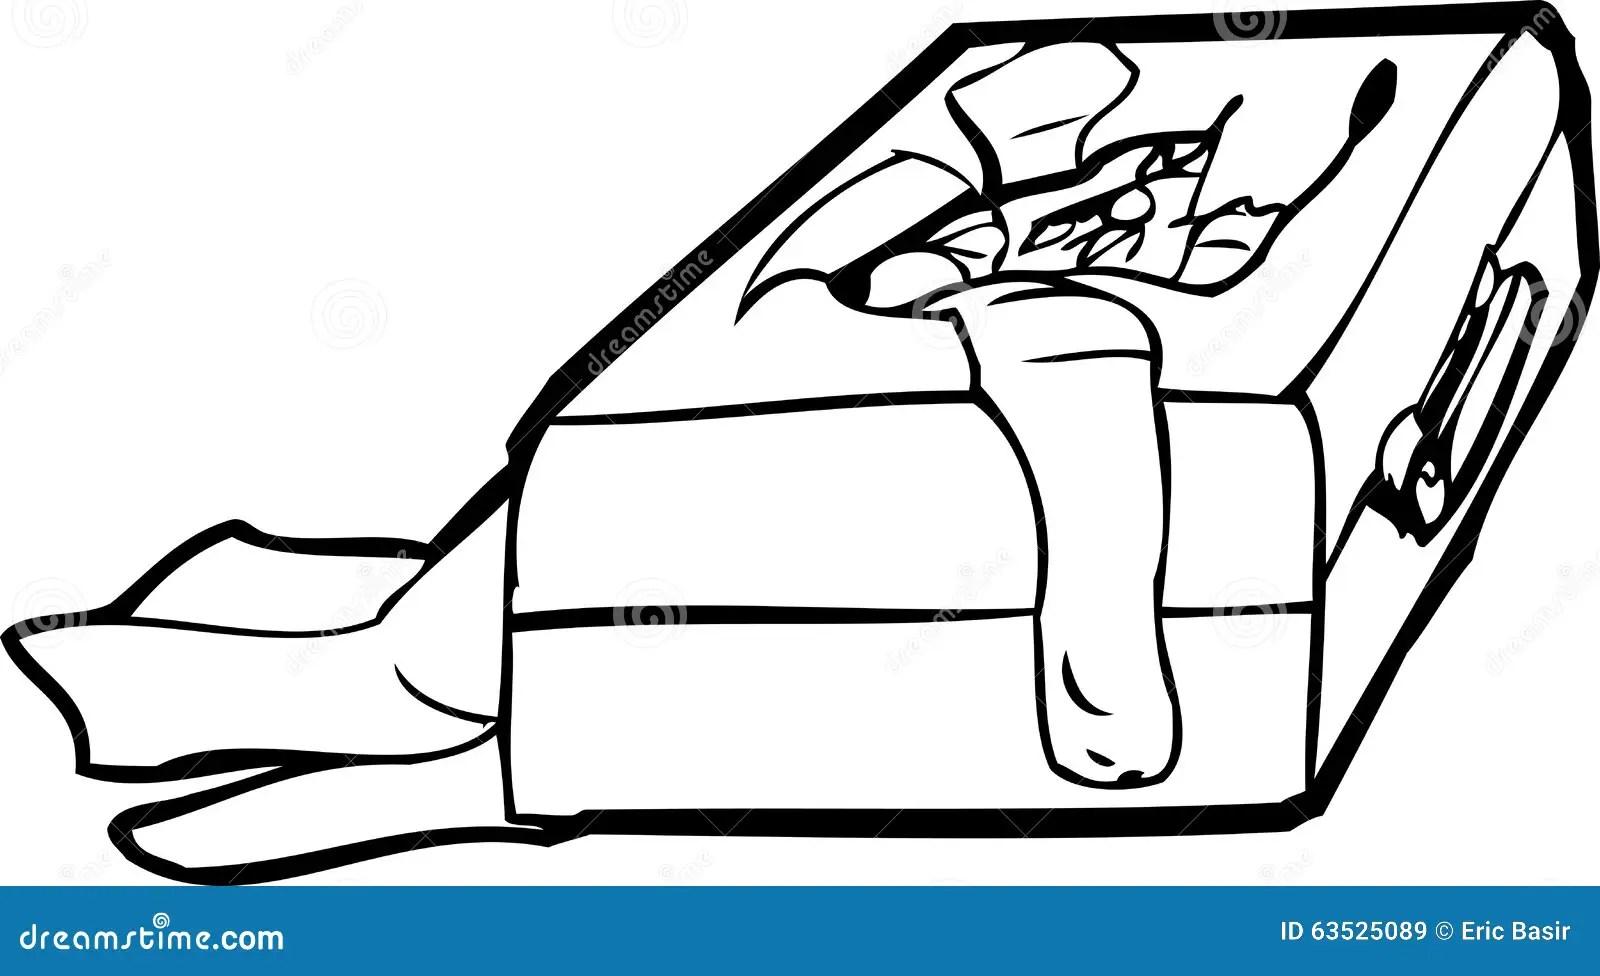 Lost Luggage Outline Stock Illustration Illustration Of